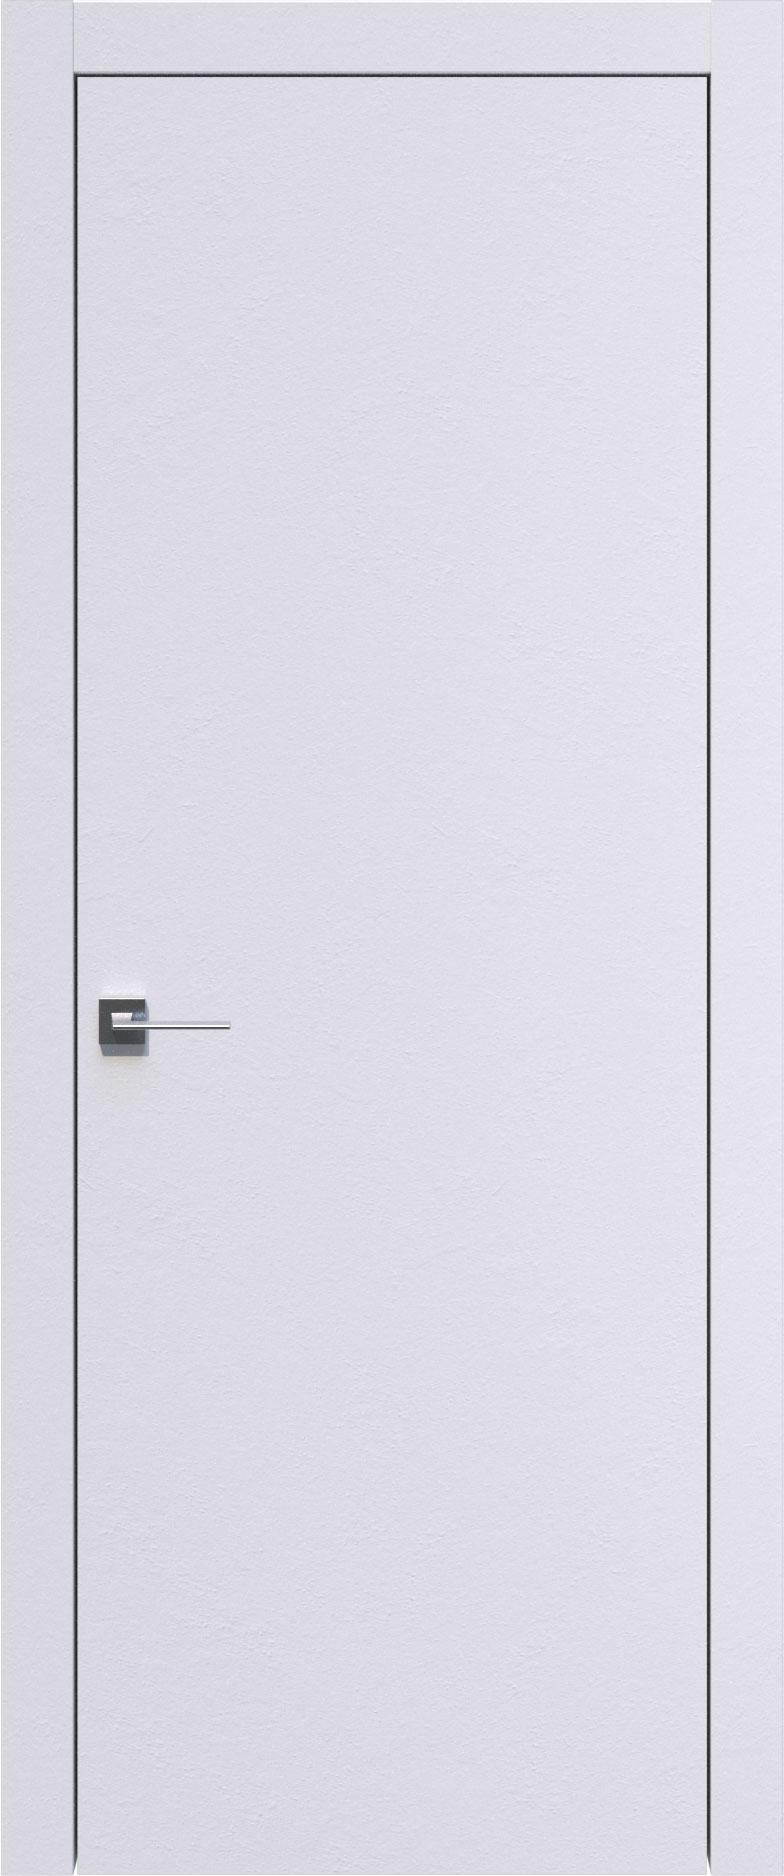 Tivoli И-1 цвет - Арктик белый Без стекла (ДГ)